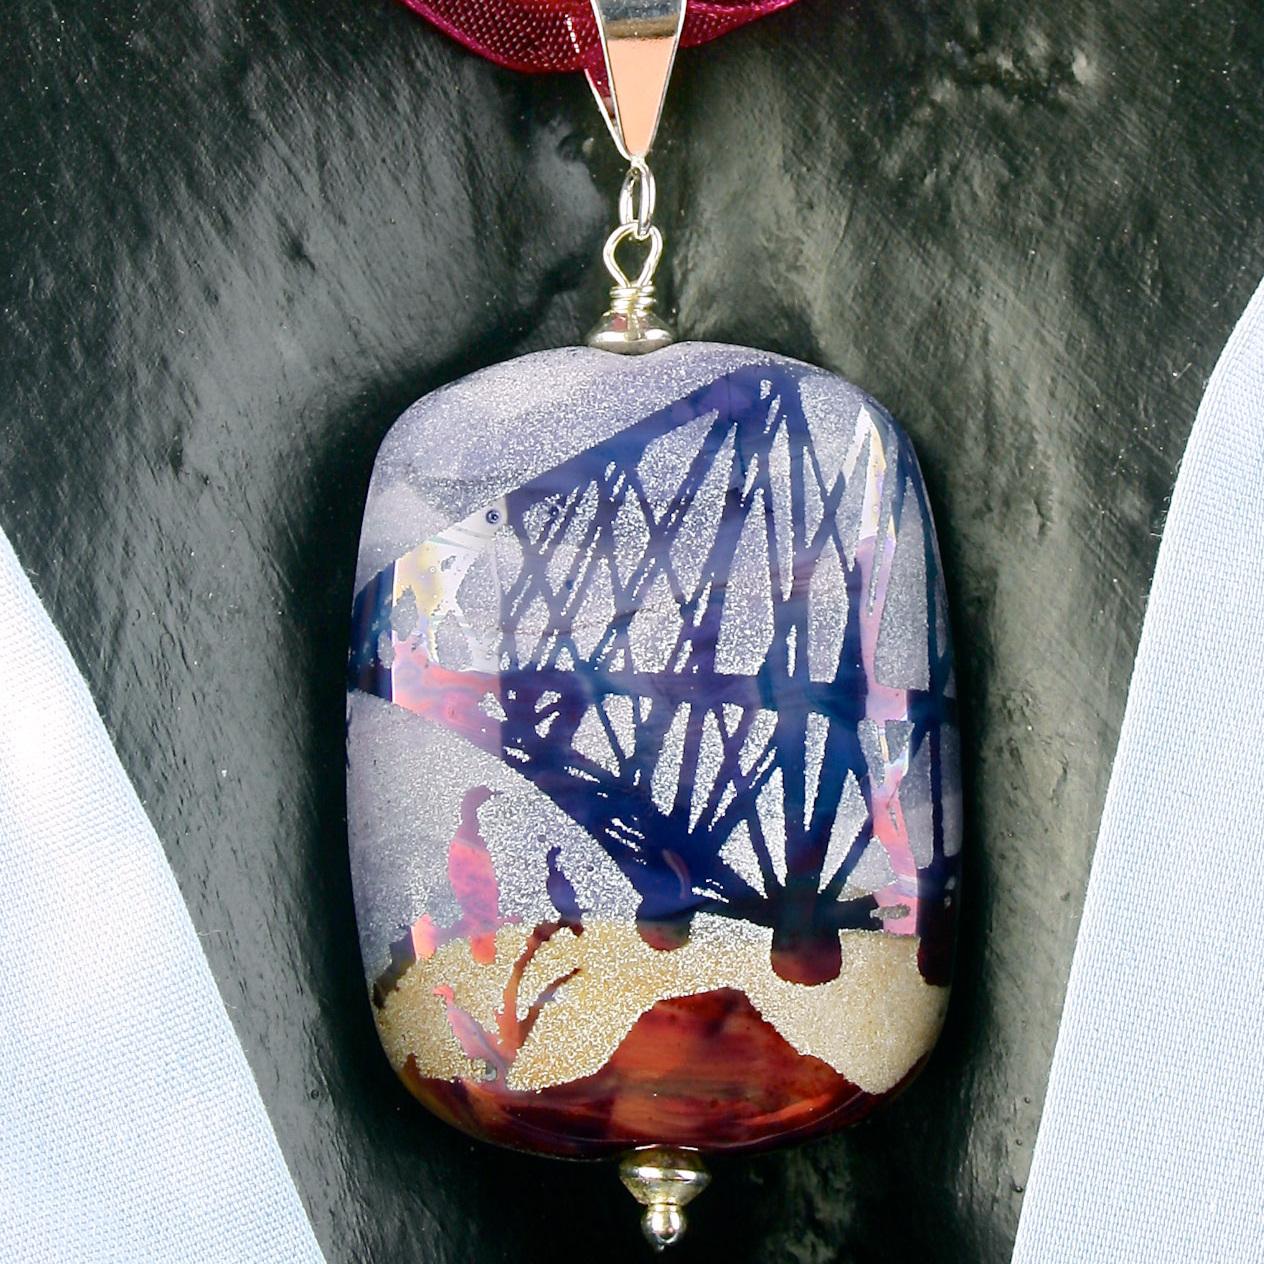 Barony Wood/Masque Beads